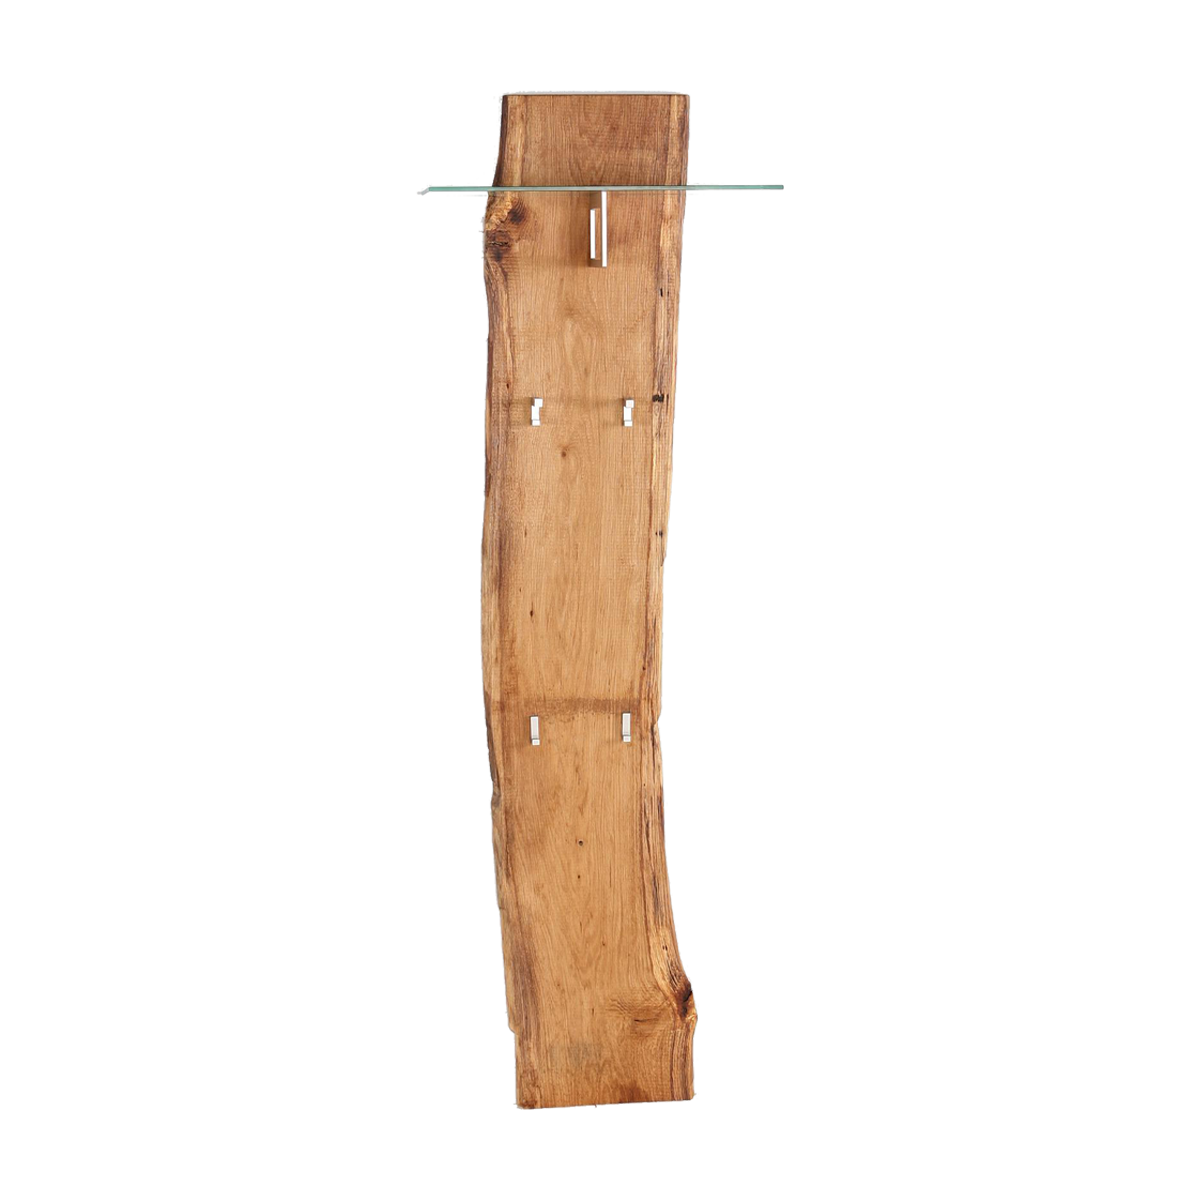 skalik meble woodline garderobenpaneel mit glasplatte